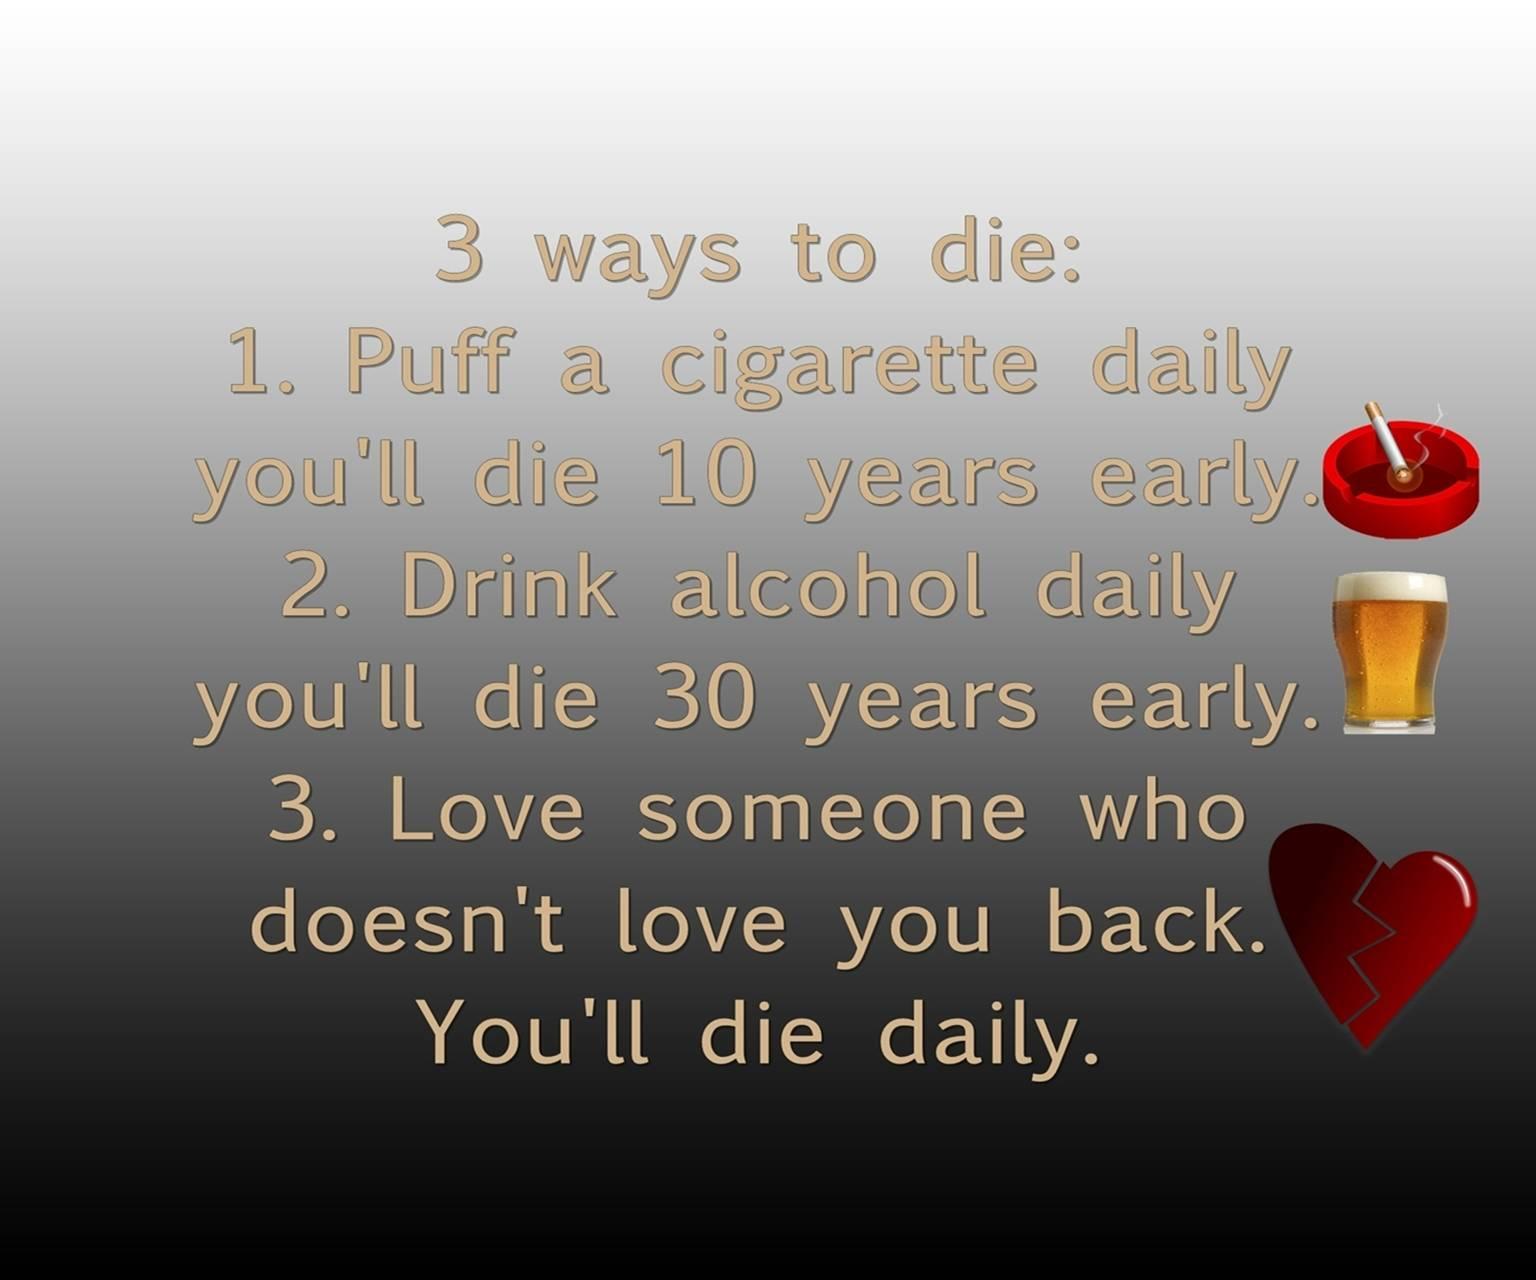 3 ways to die